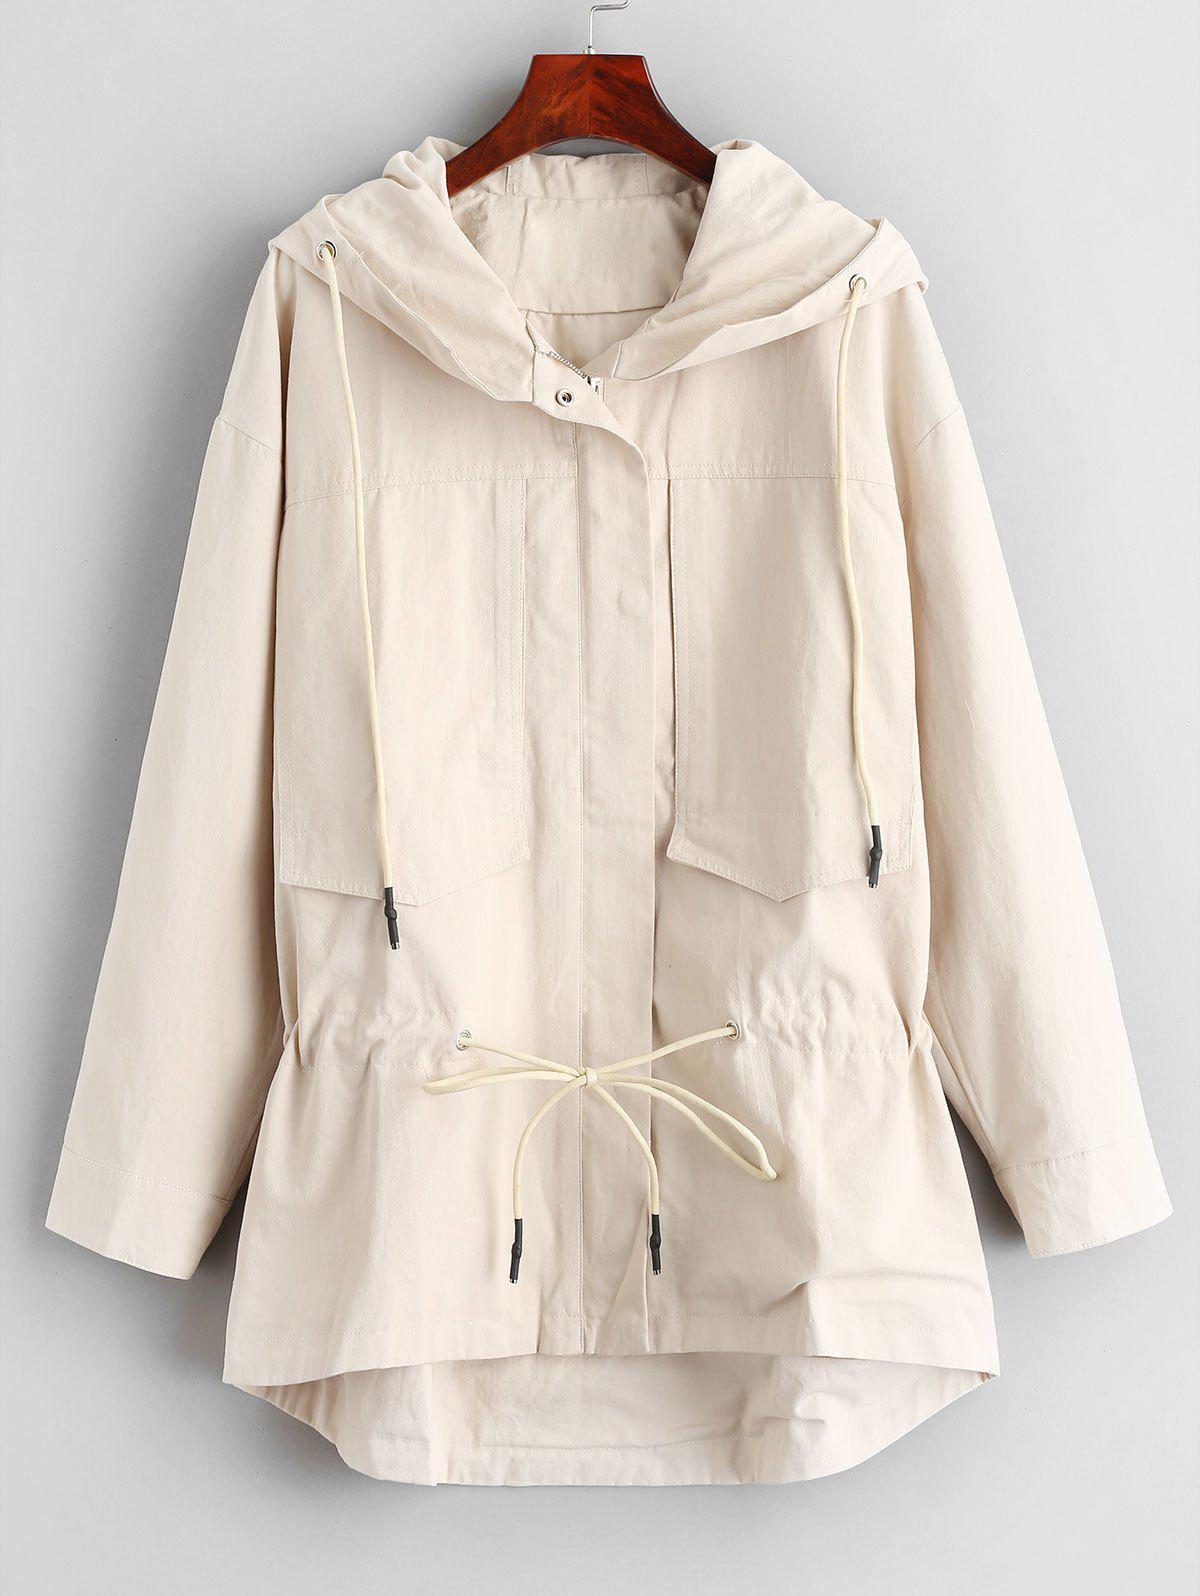 Image of Zip Up Drawstring Hooded Coat